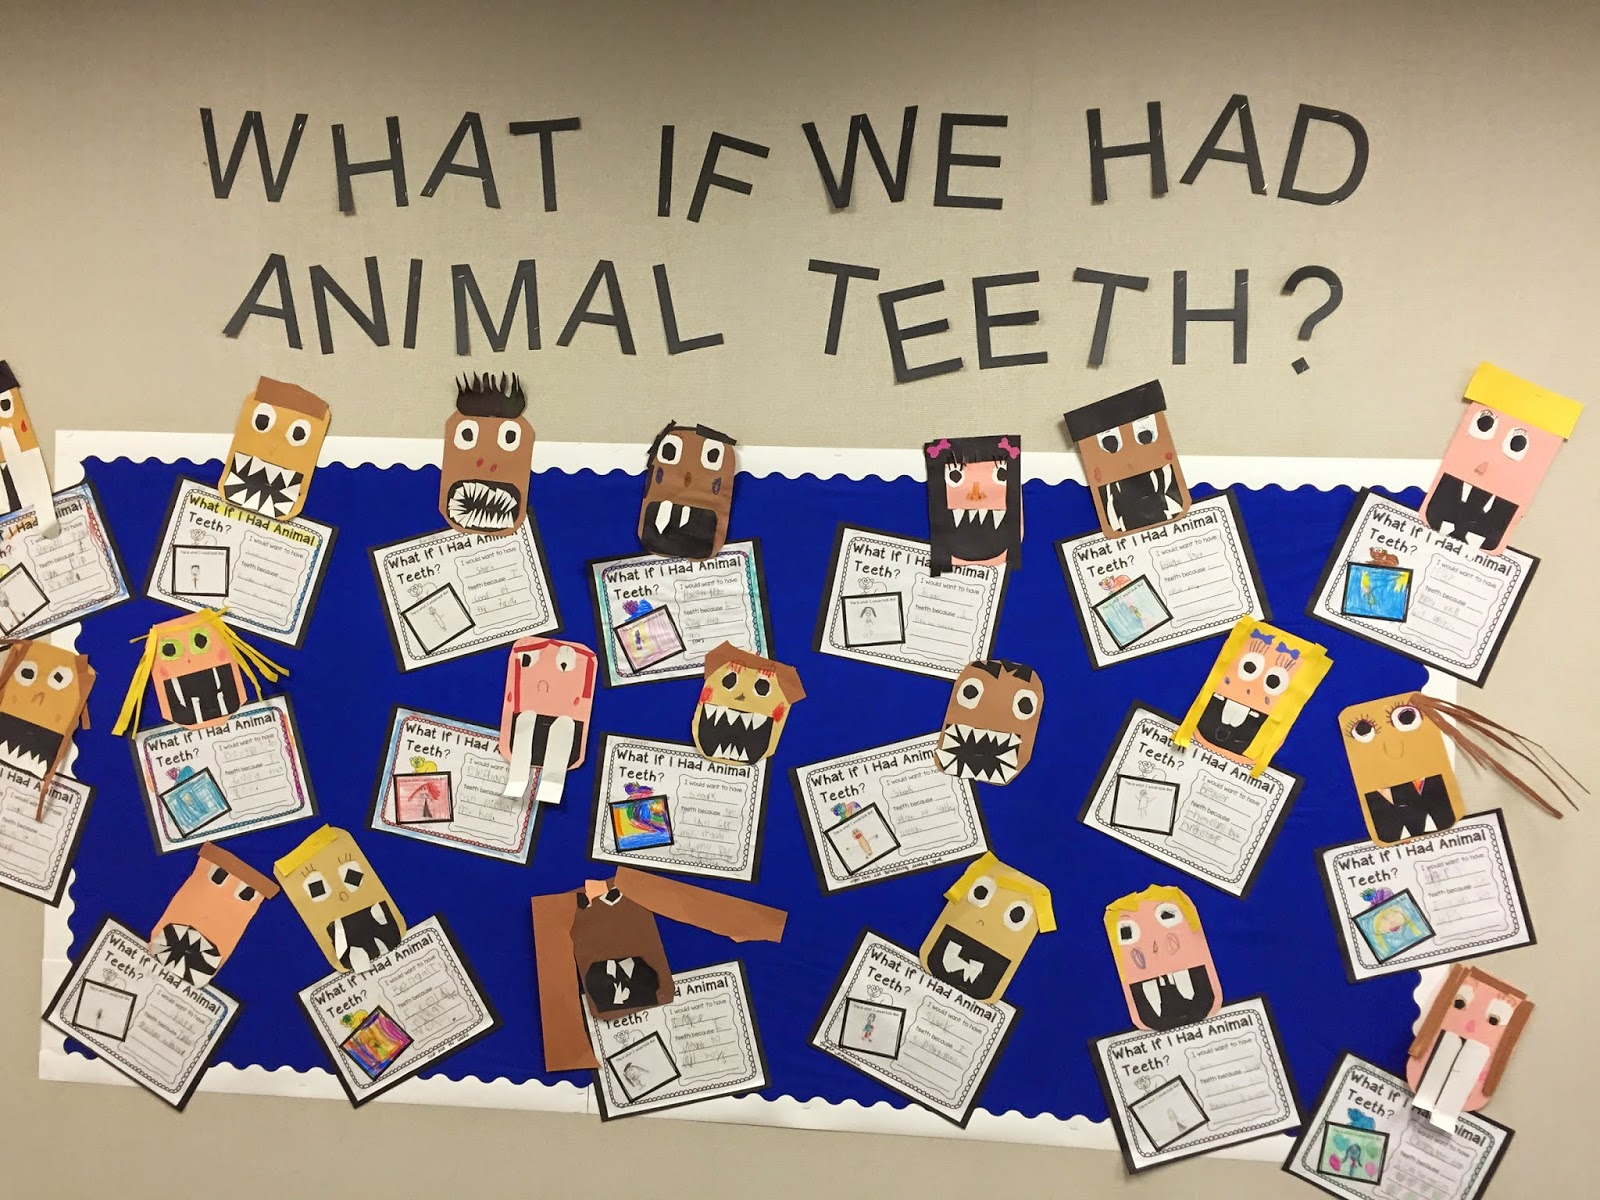 what if you had animal teeth pdf